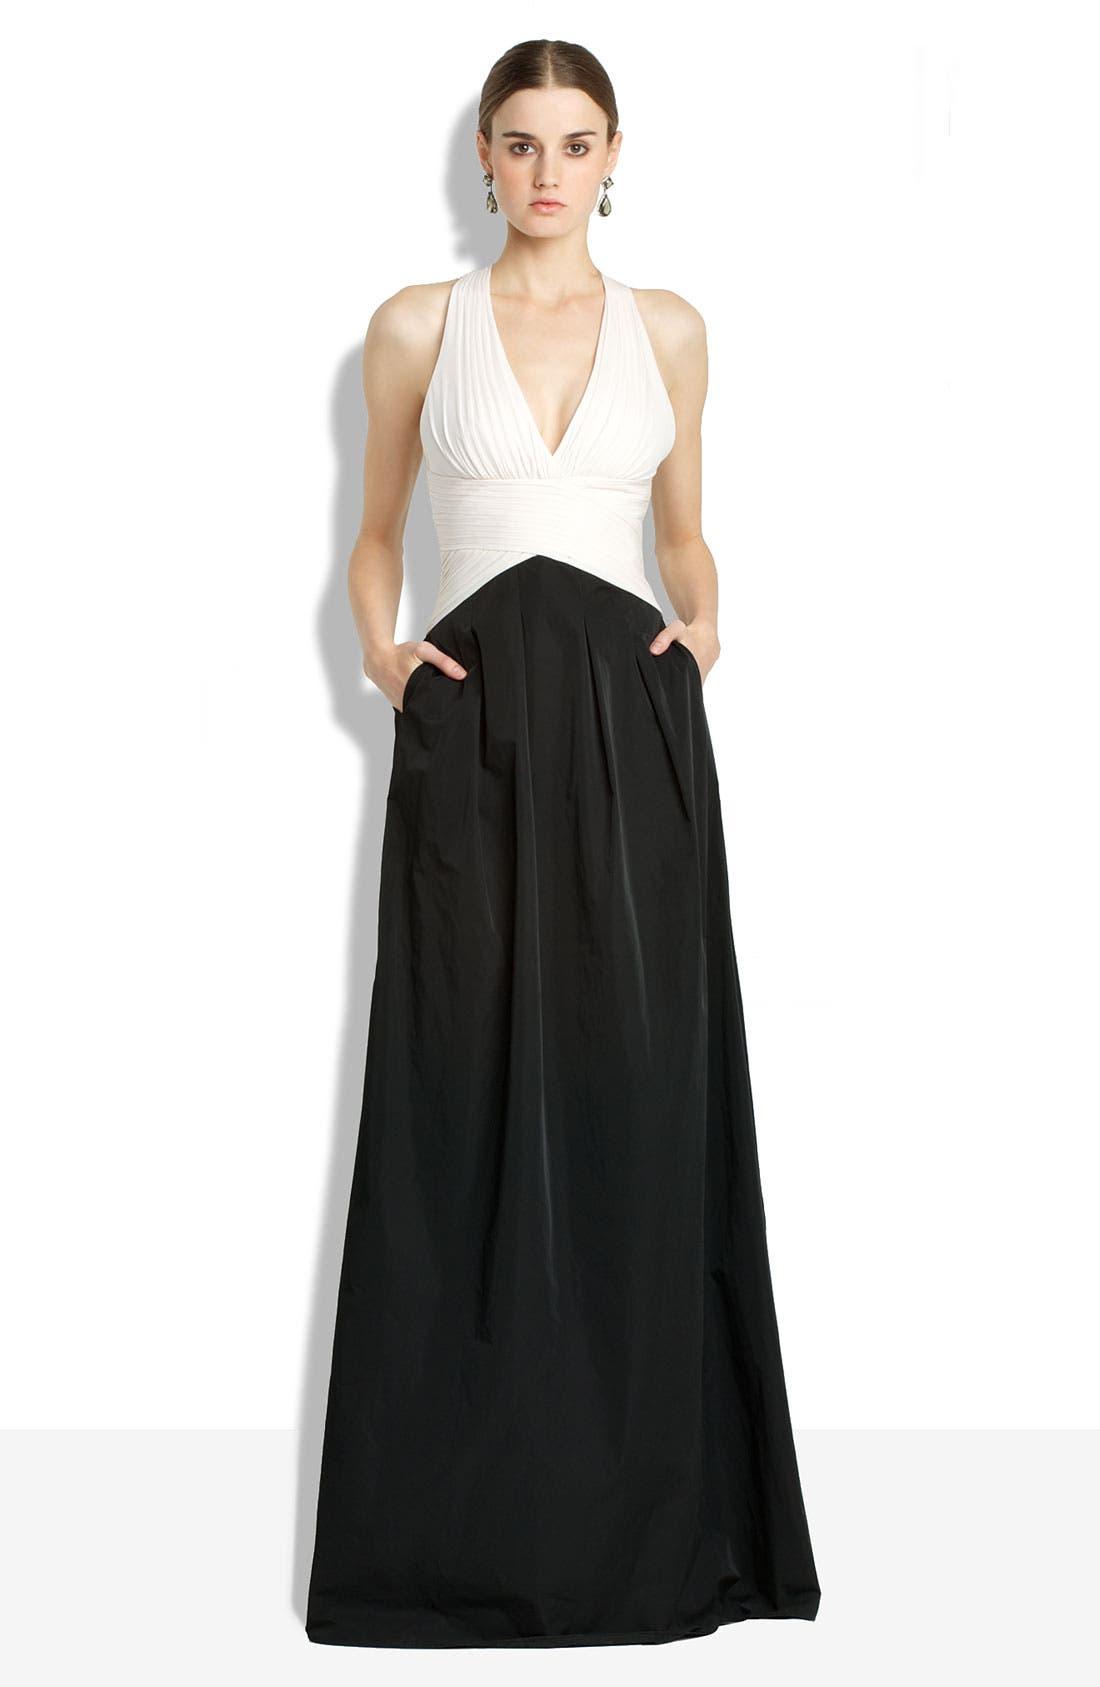 Alternate Image 1 Selected - BCBGMAXAZRIA Open Back Chiffon & Taffeta Gown